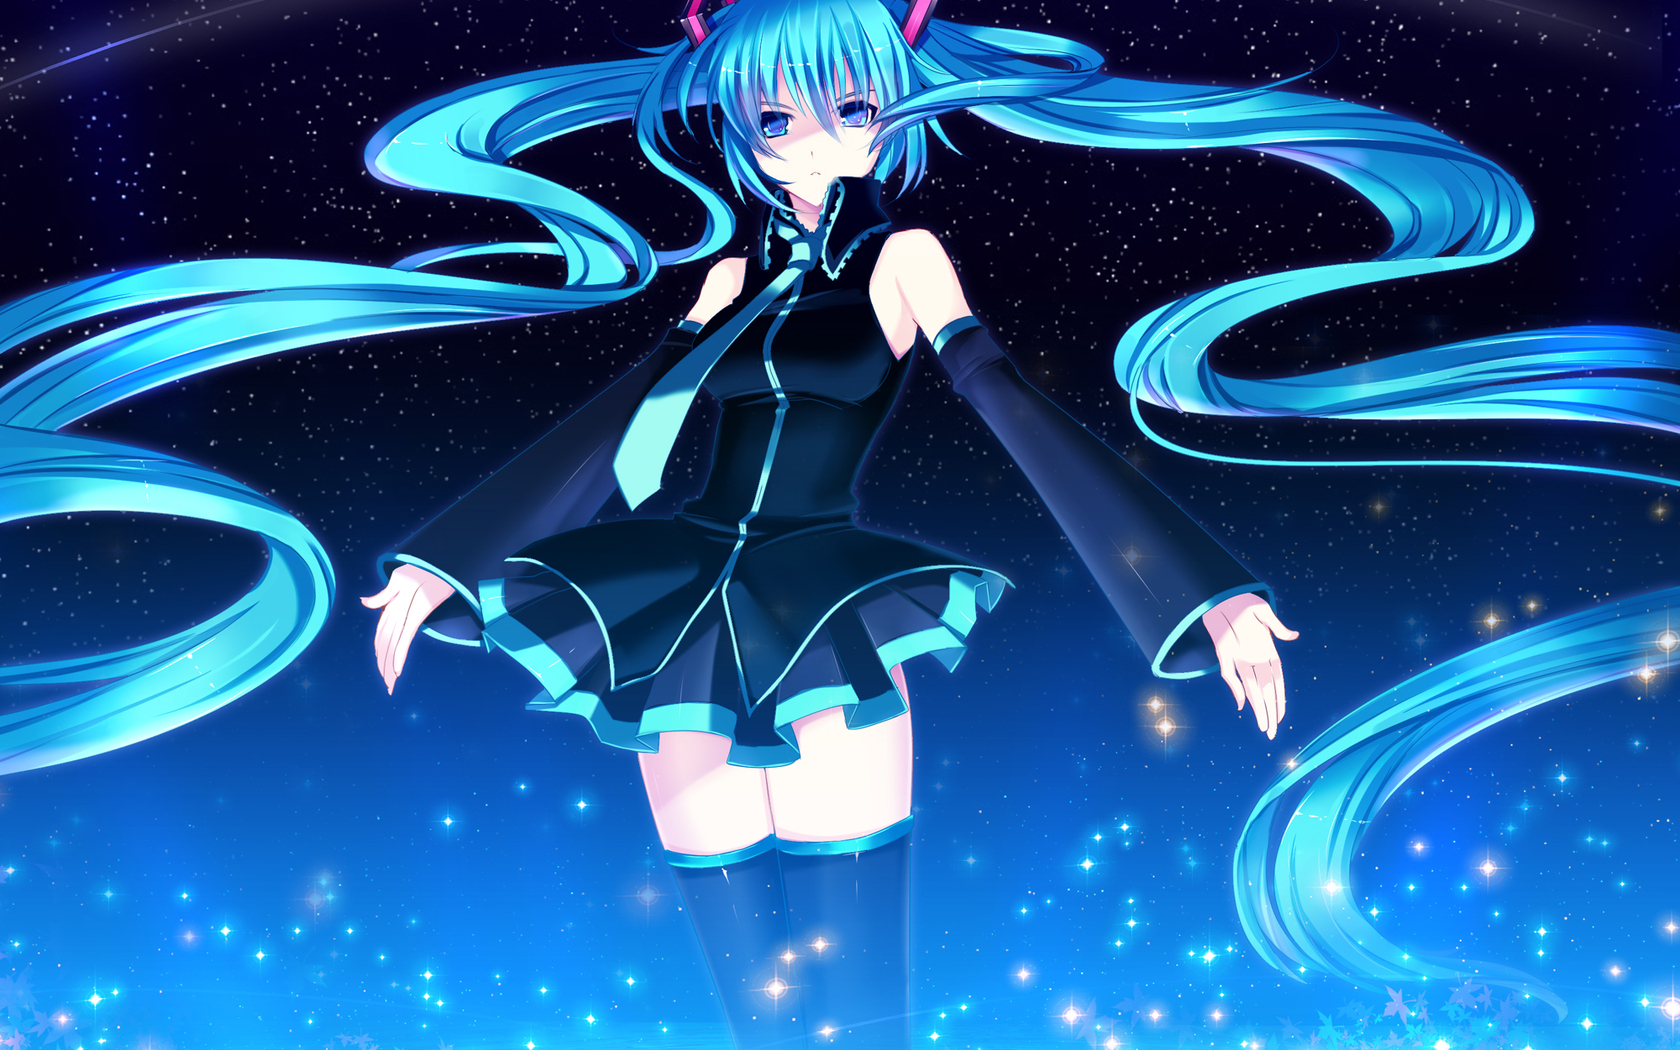 Image Anime Vocaloid Hatsune Miku Wallpaper Jpg Community